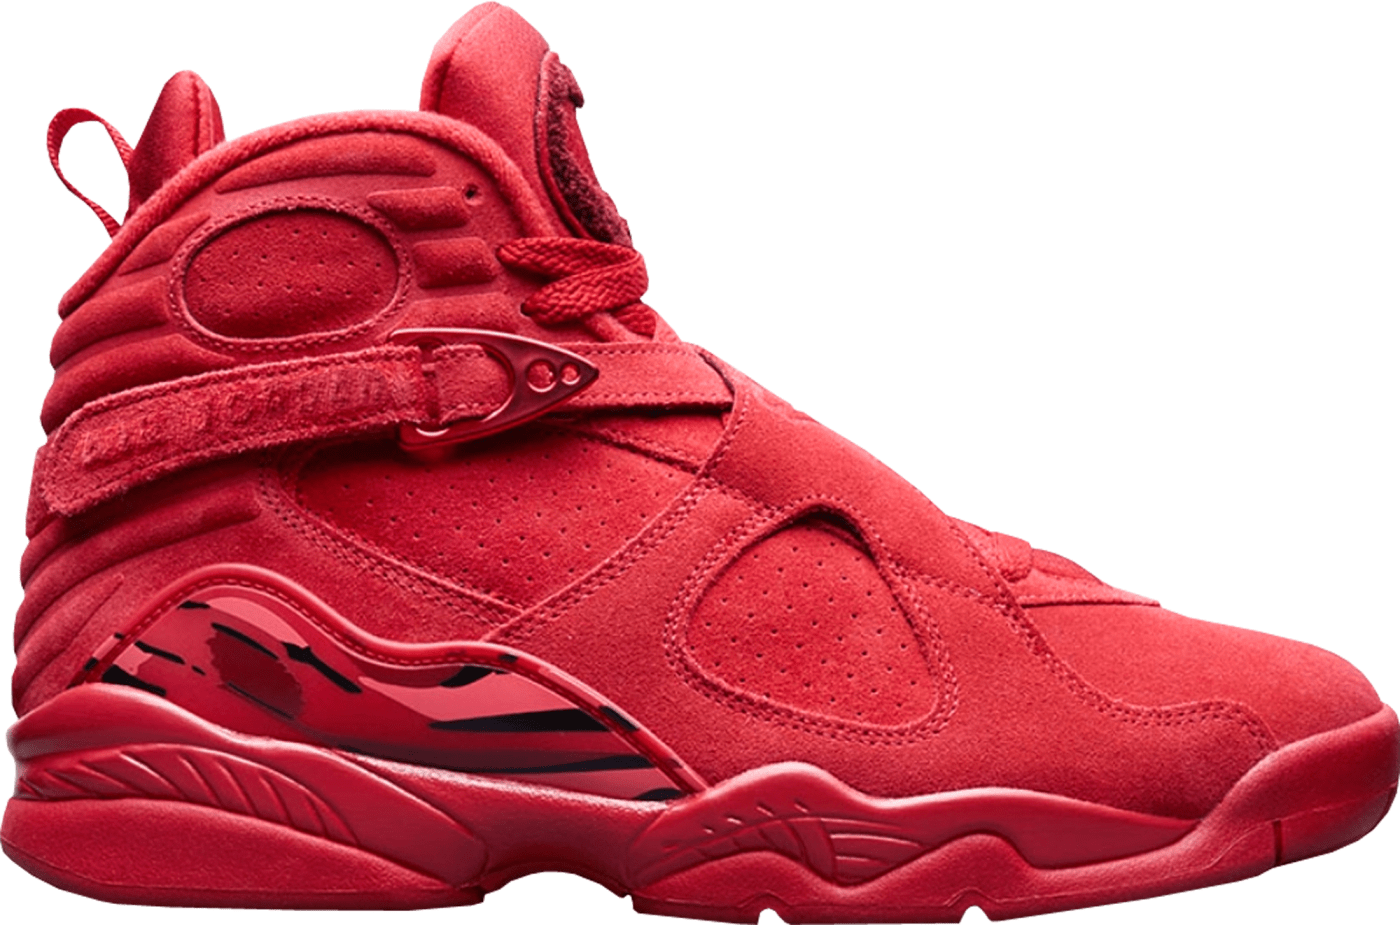 Jordan 8 Retro Valentines Day 2018 W